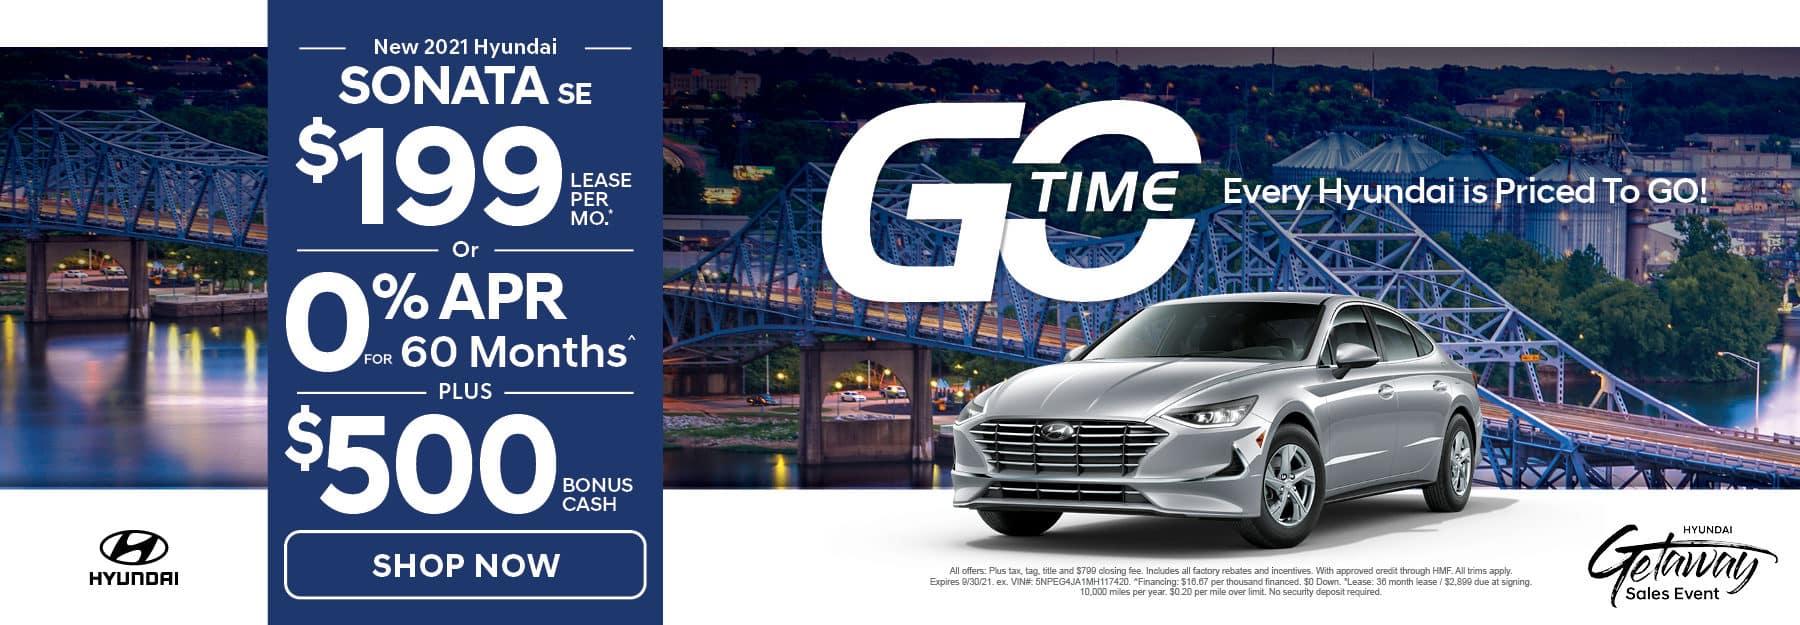 Go Time - New 2021 Hyundai Sonata